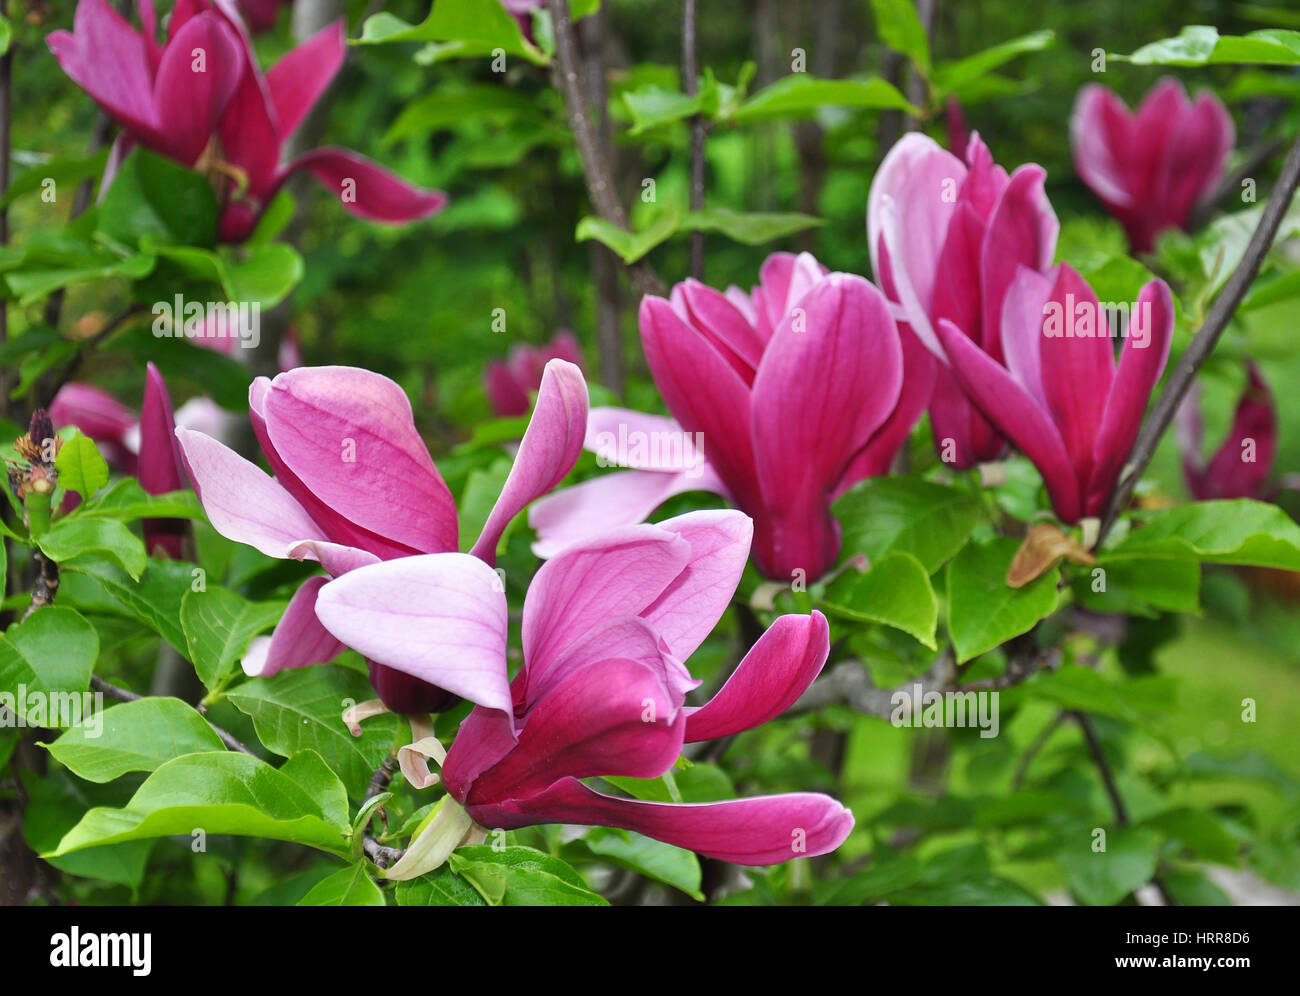 Magnolia liliiflora - Wikipedia